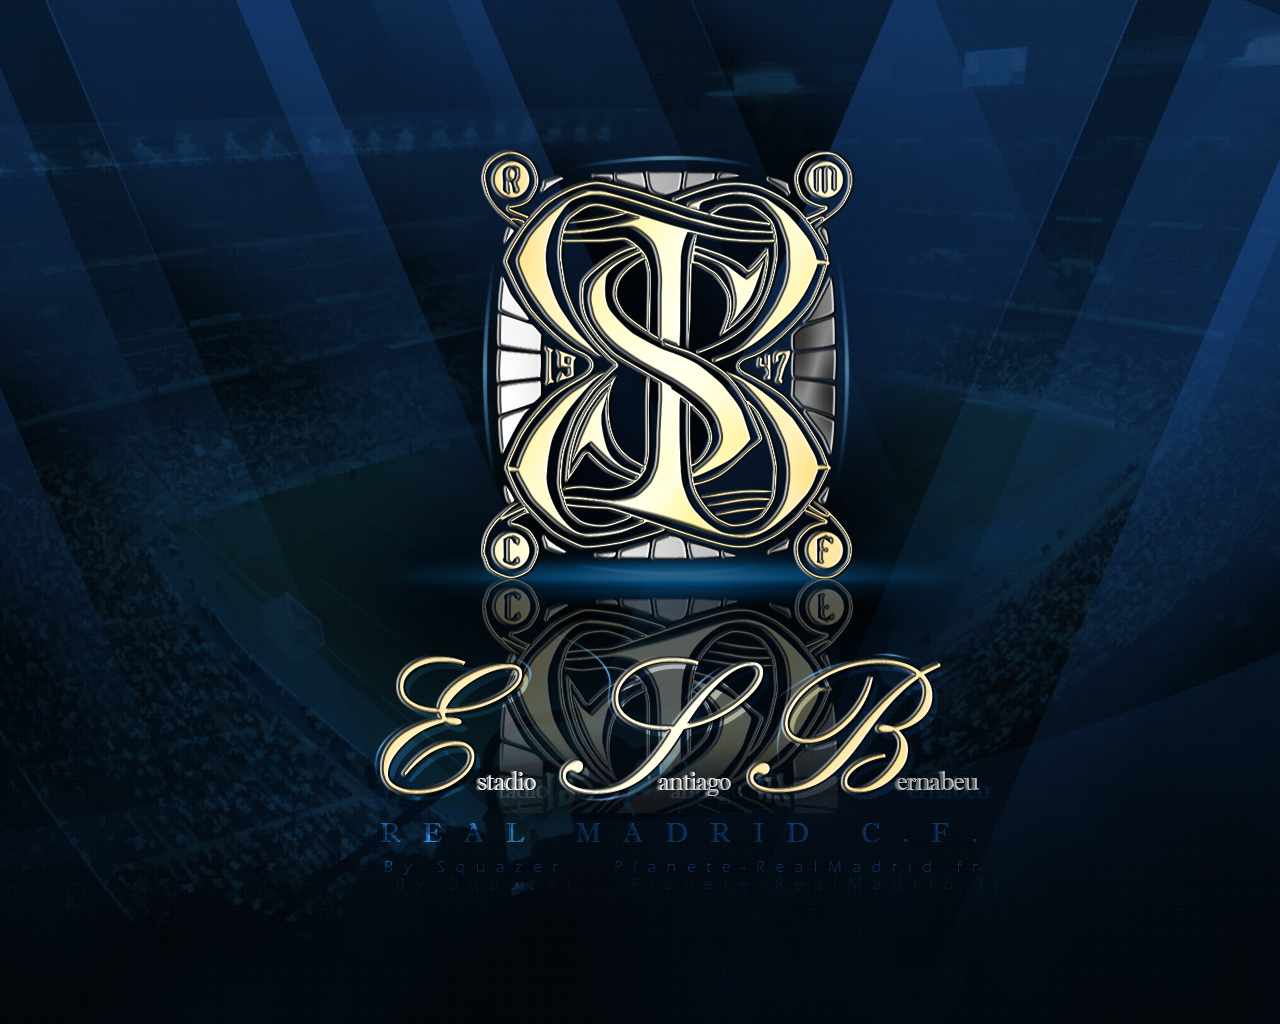 Estadio Santiago Bernabeu 2 by real-squazer on DeviantArt